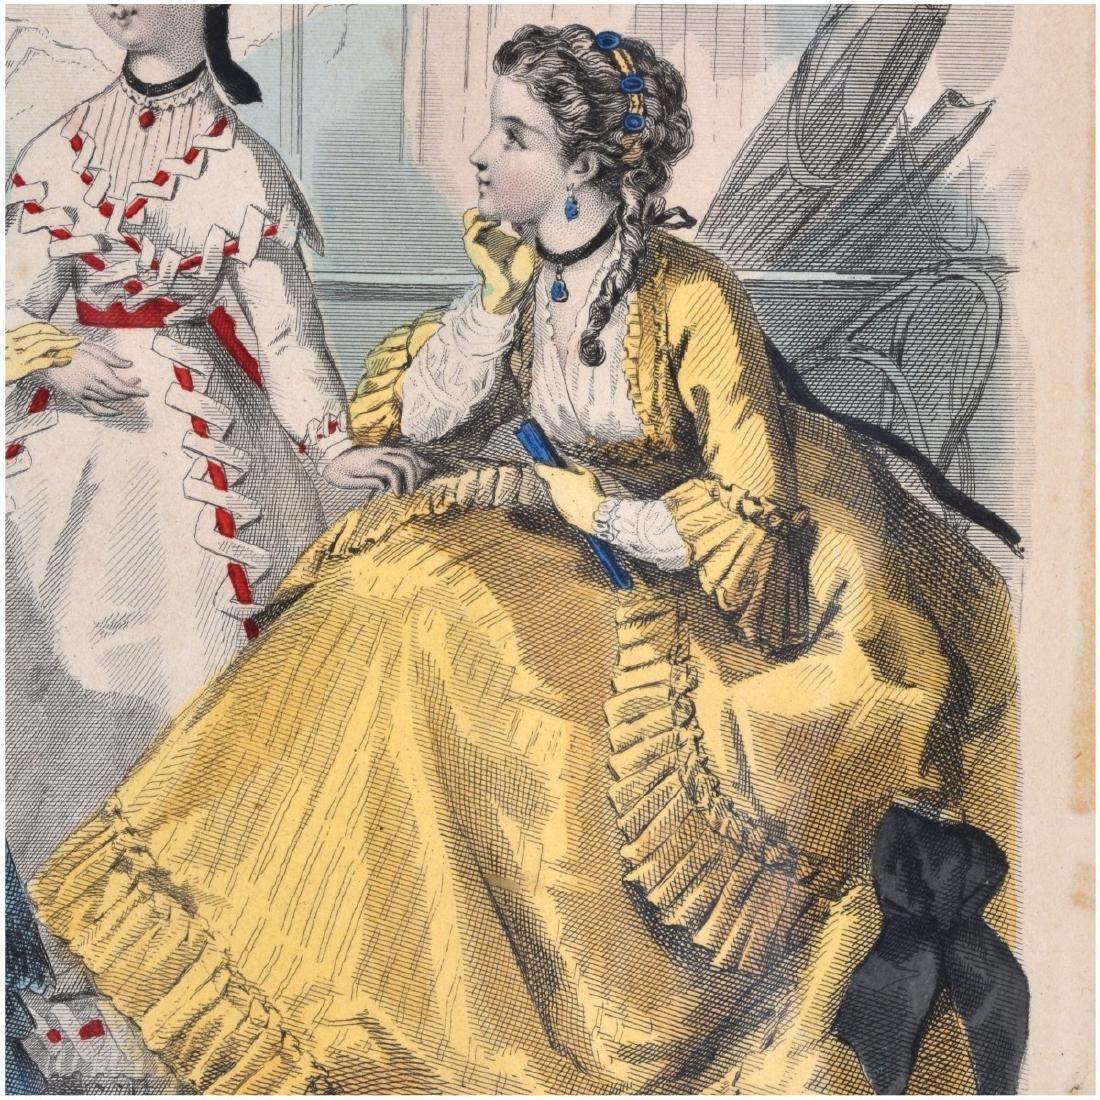 19th Century Le Follet Engravings - 4